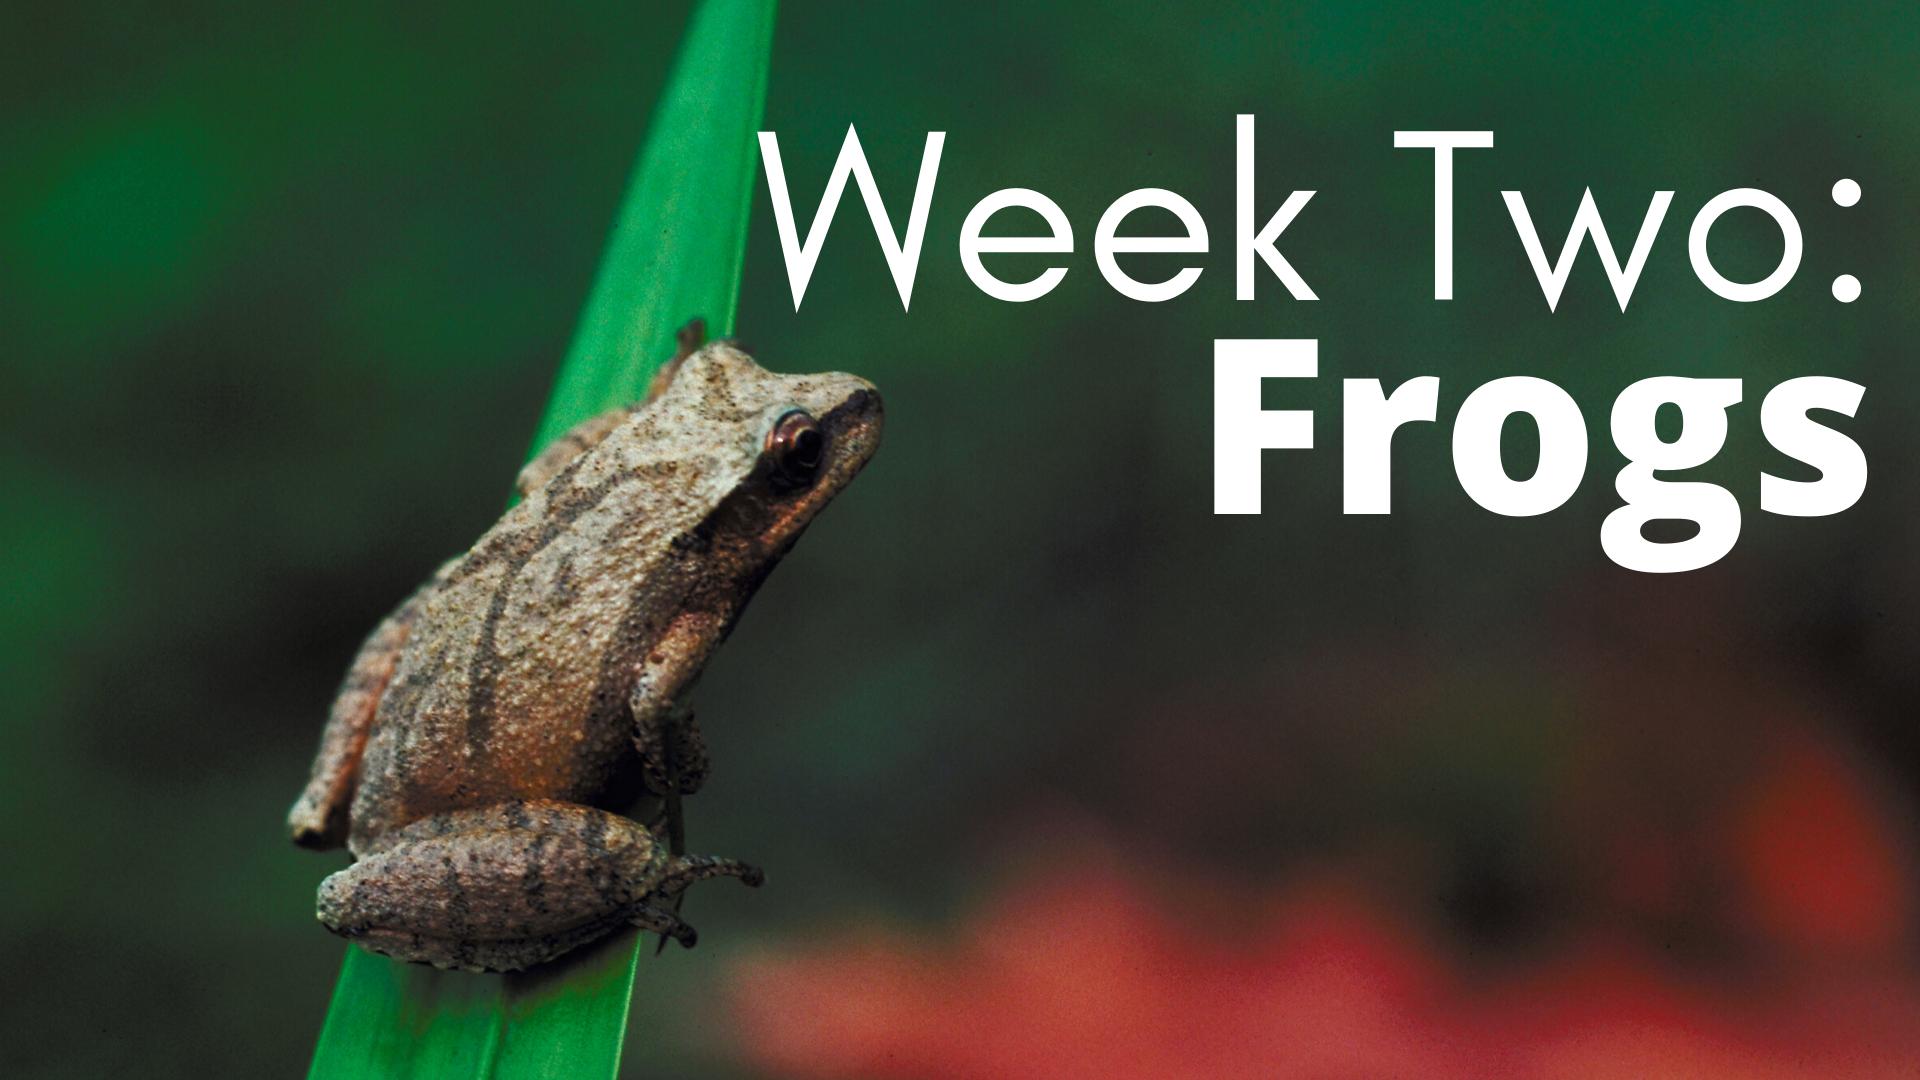 Week Two: Frogs